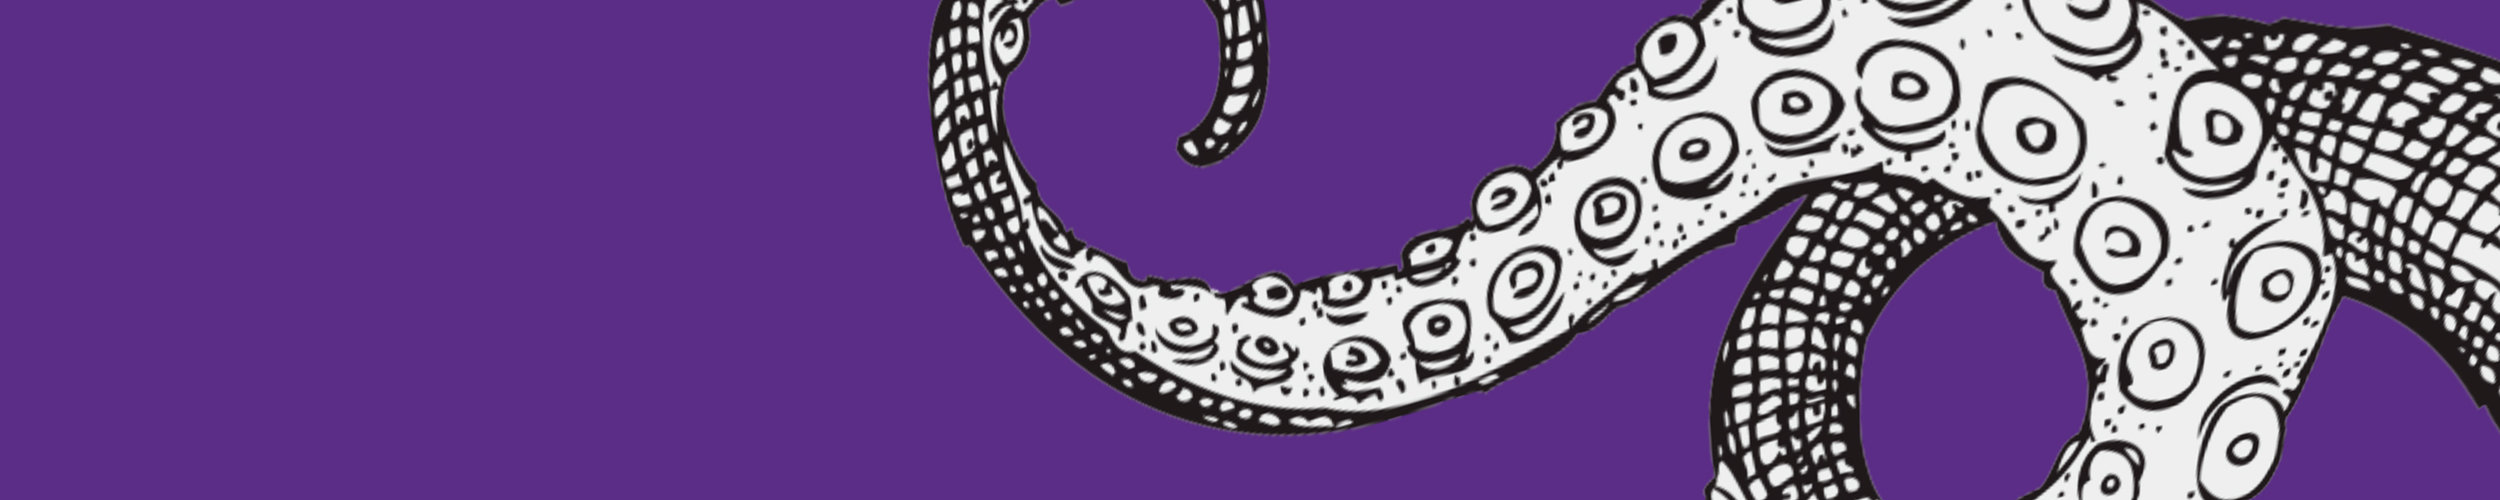 tentaclesTinyWideBanner.jpg